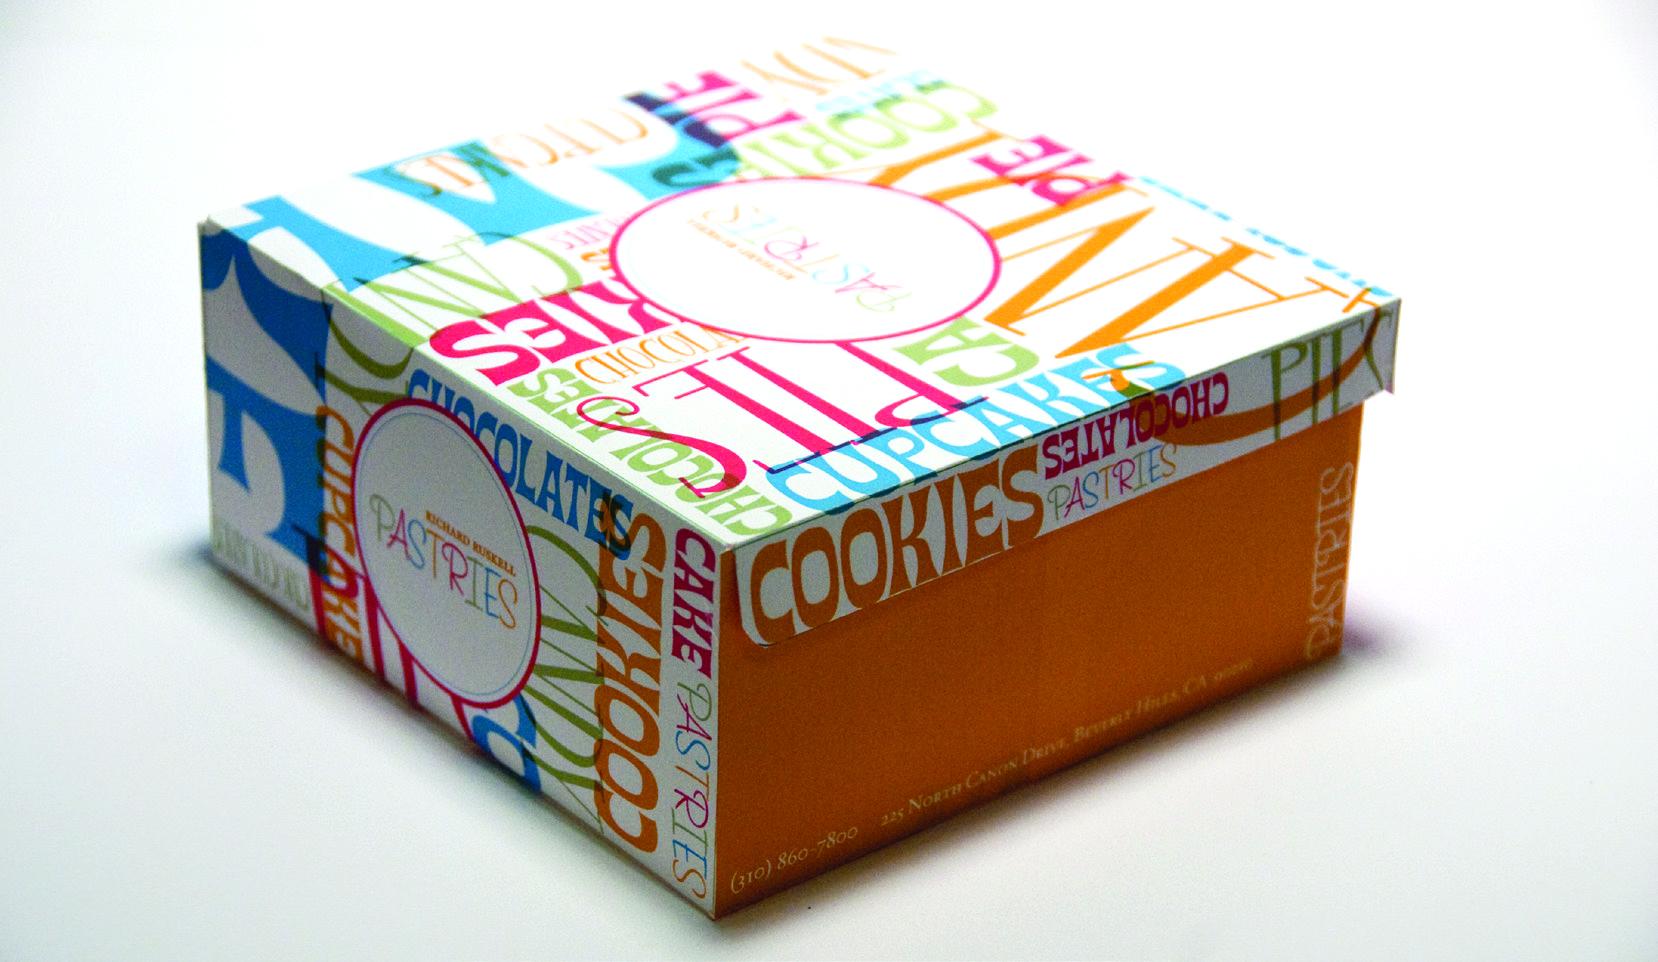 CakeBoxPackageConcept